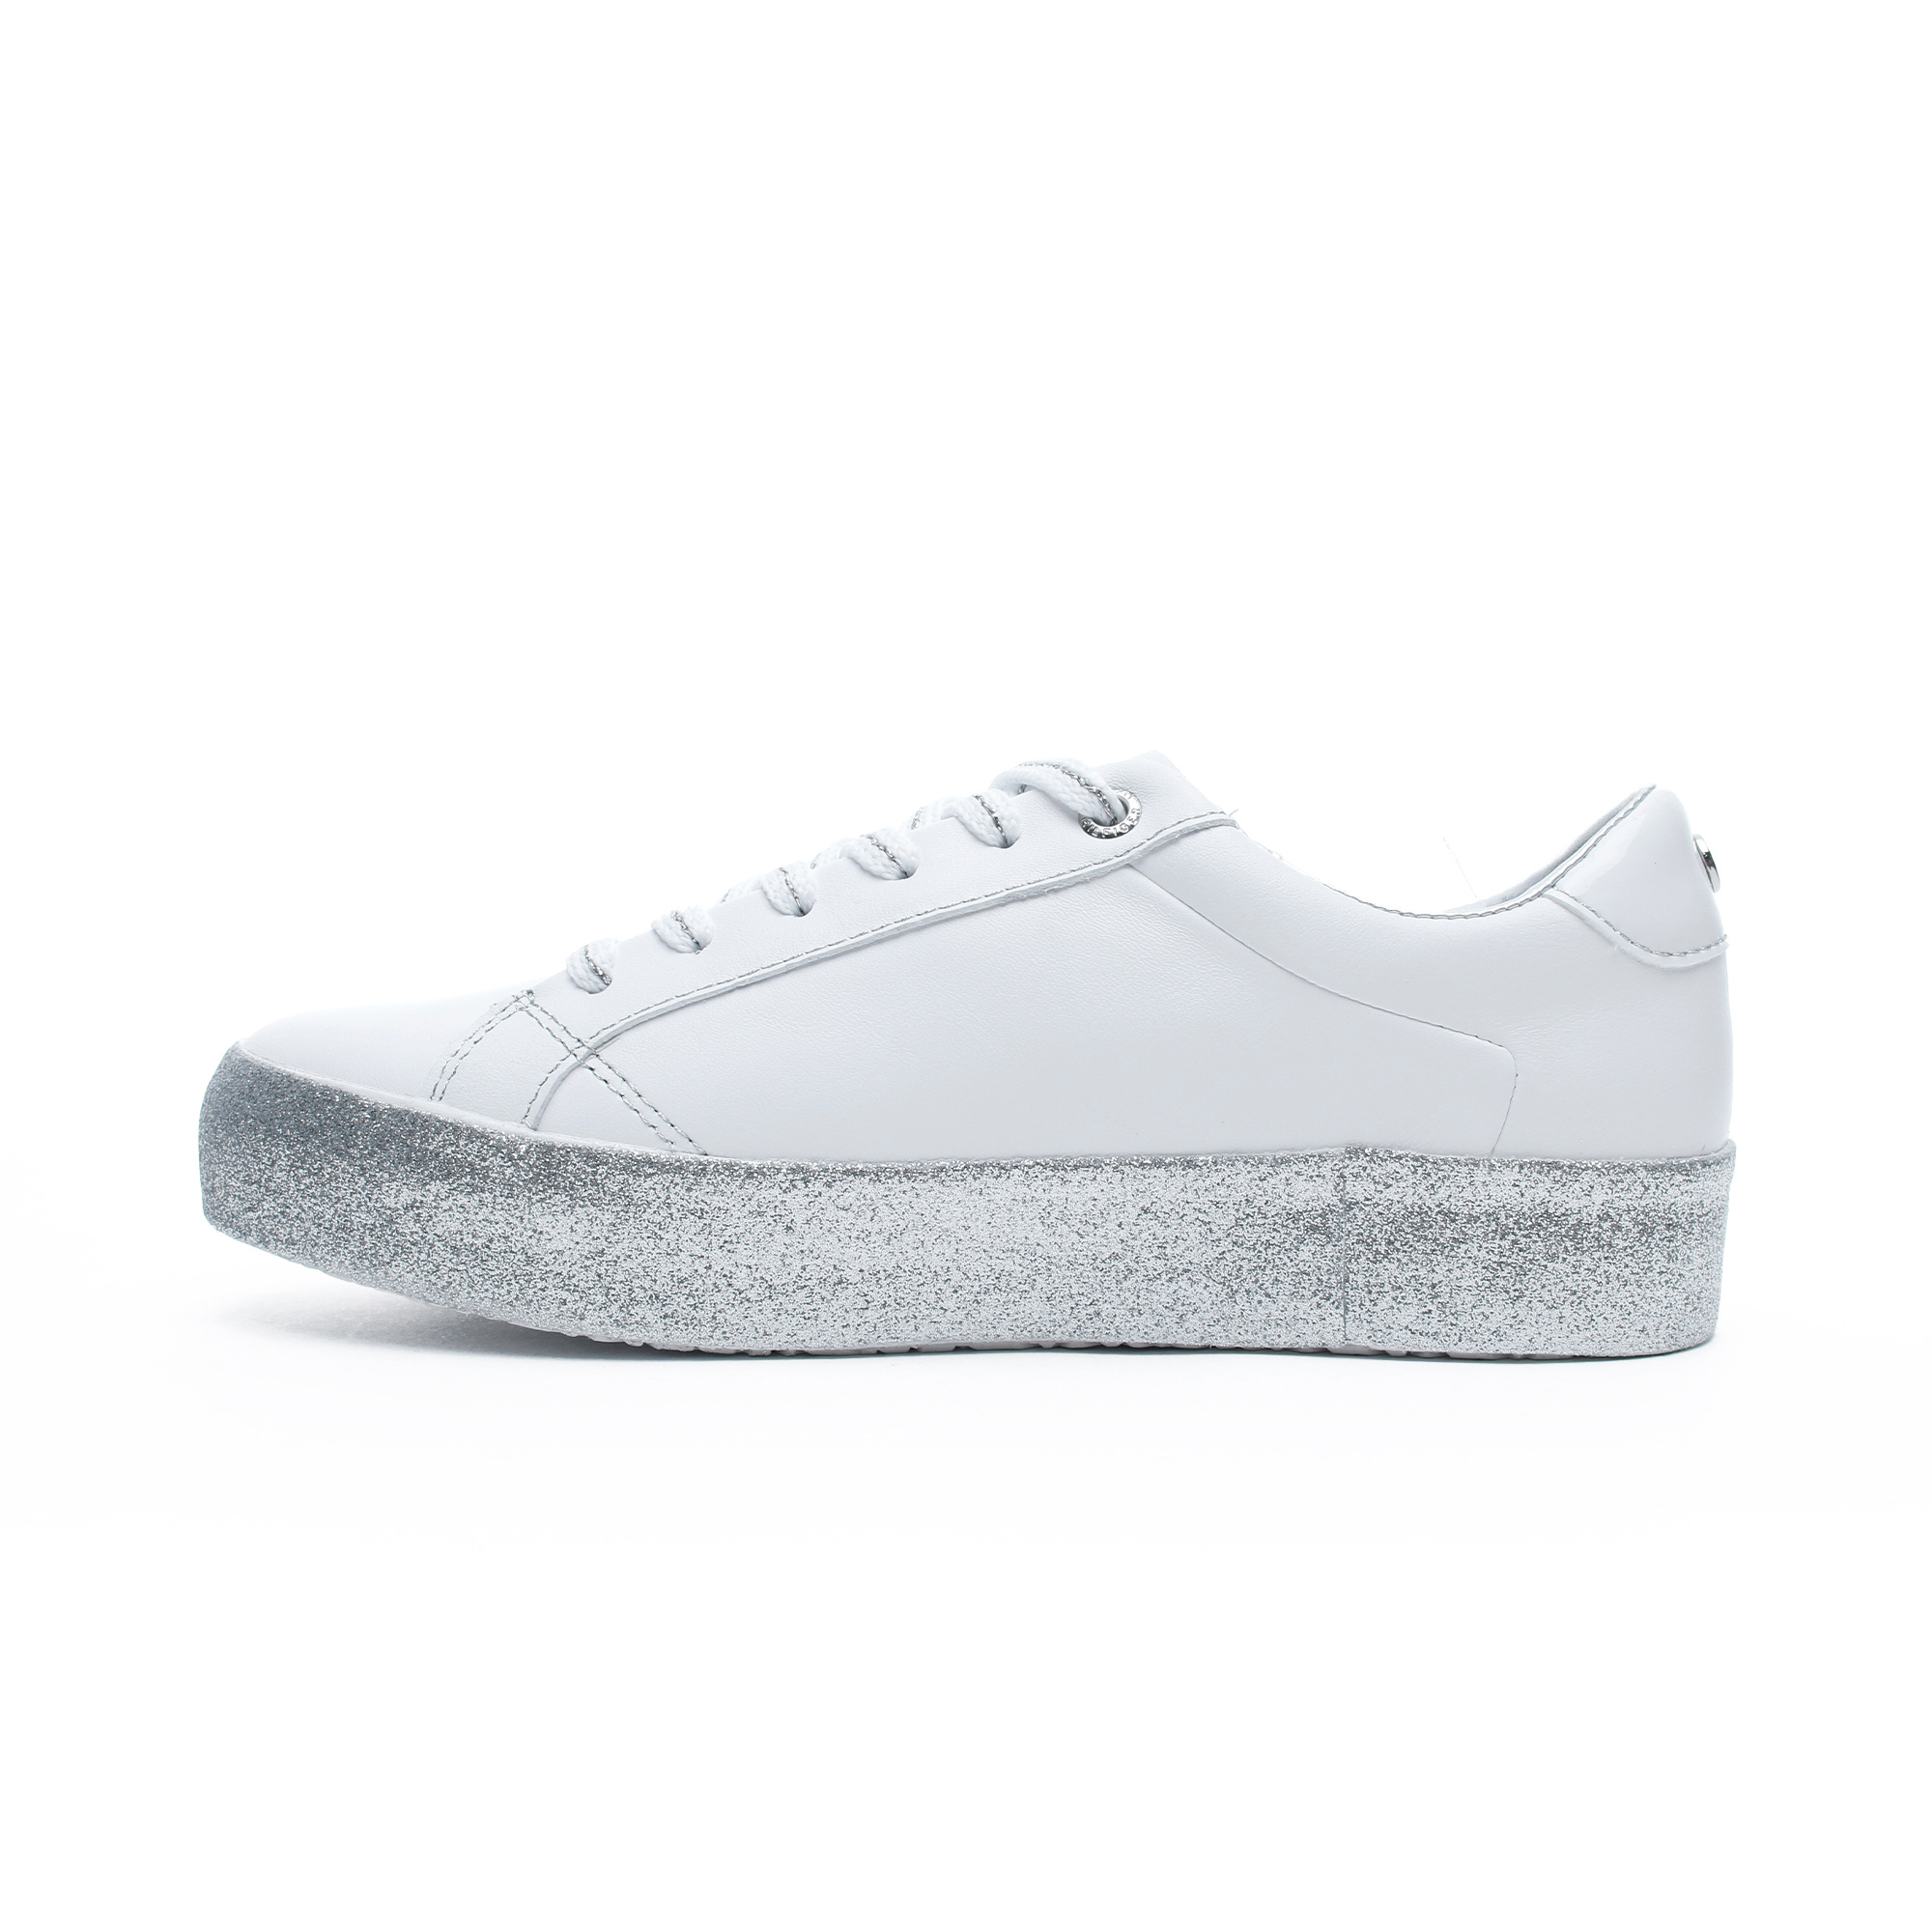 Tommy Hilfiger Glitter Foxing Dress Kadın Beyaz Spor Ayakkabı